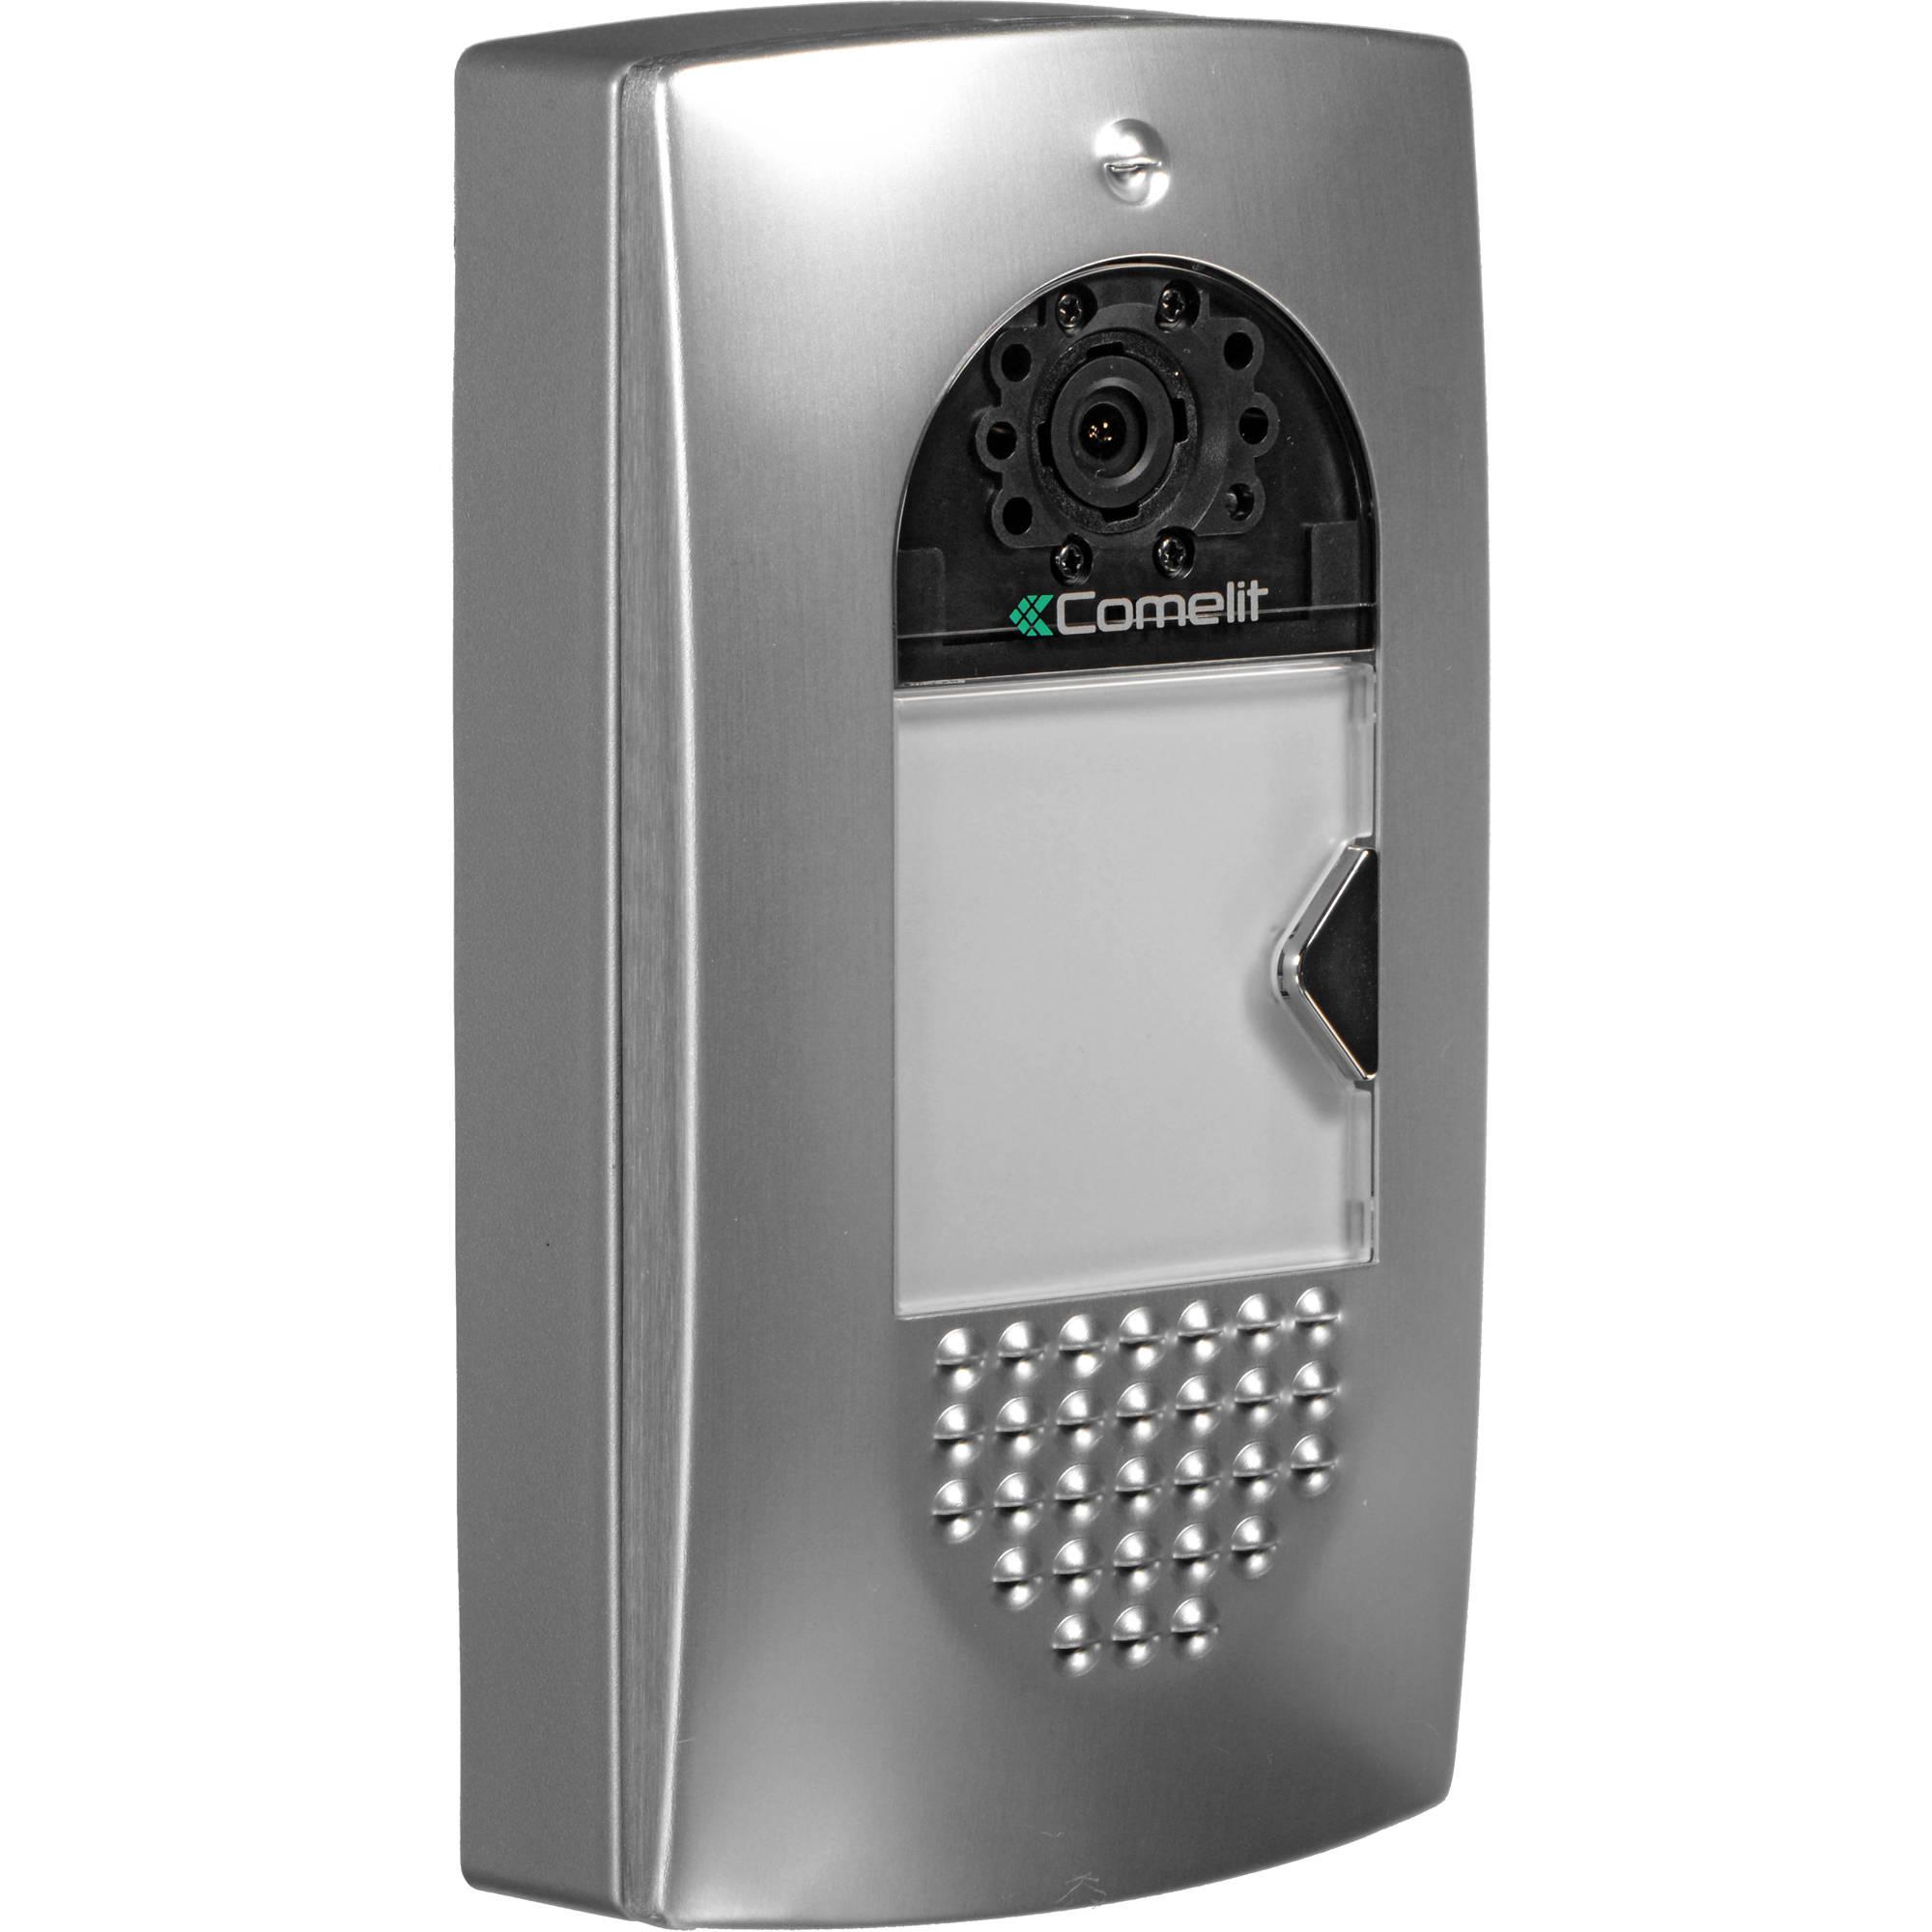 On Q Door Intercom.Intercom Systems. IP Intercom External Call ...